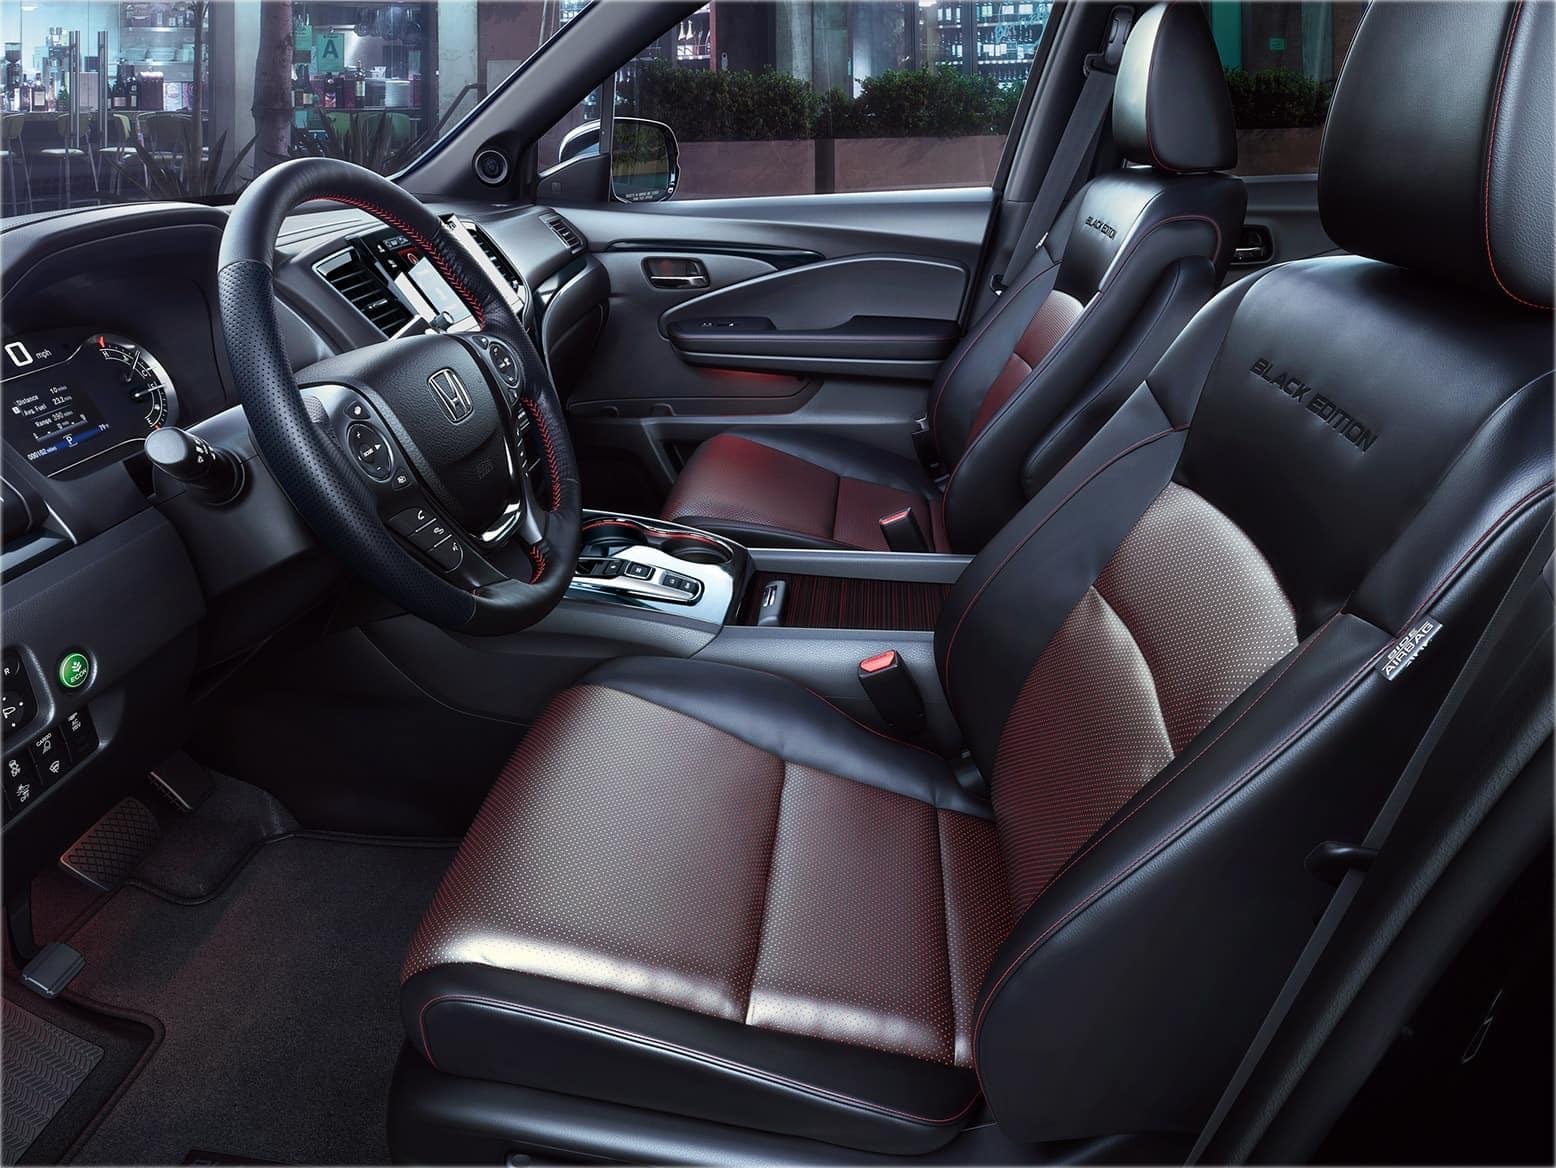 2021 Honda black edition leather seats